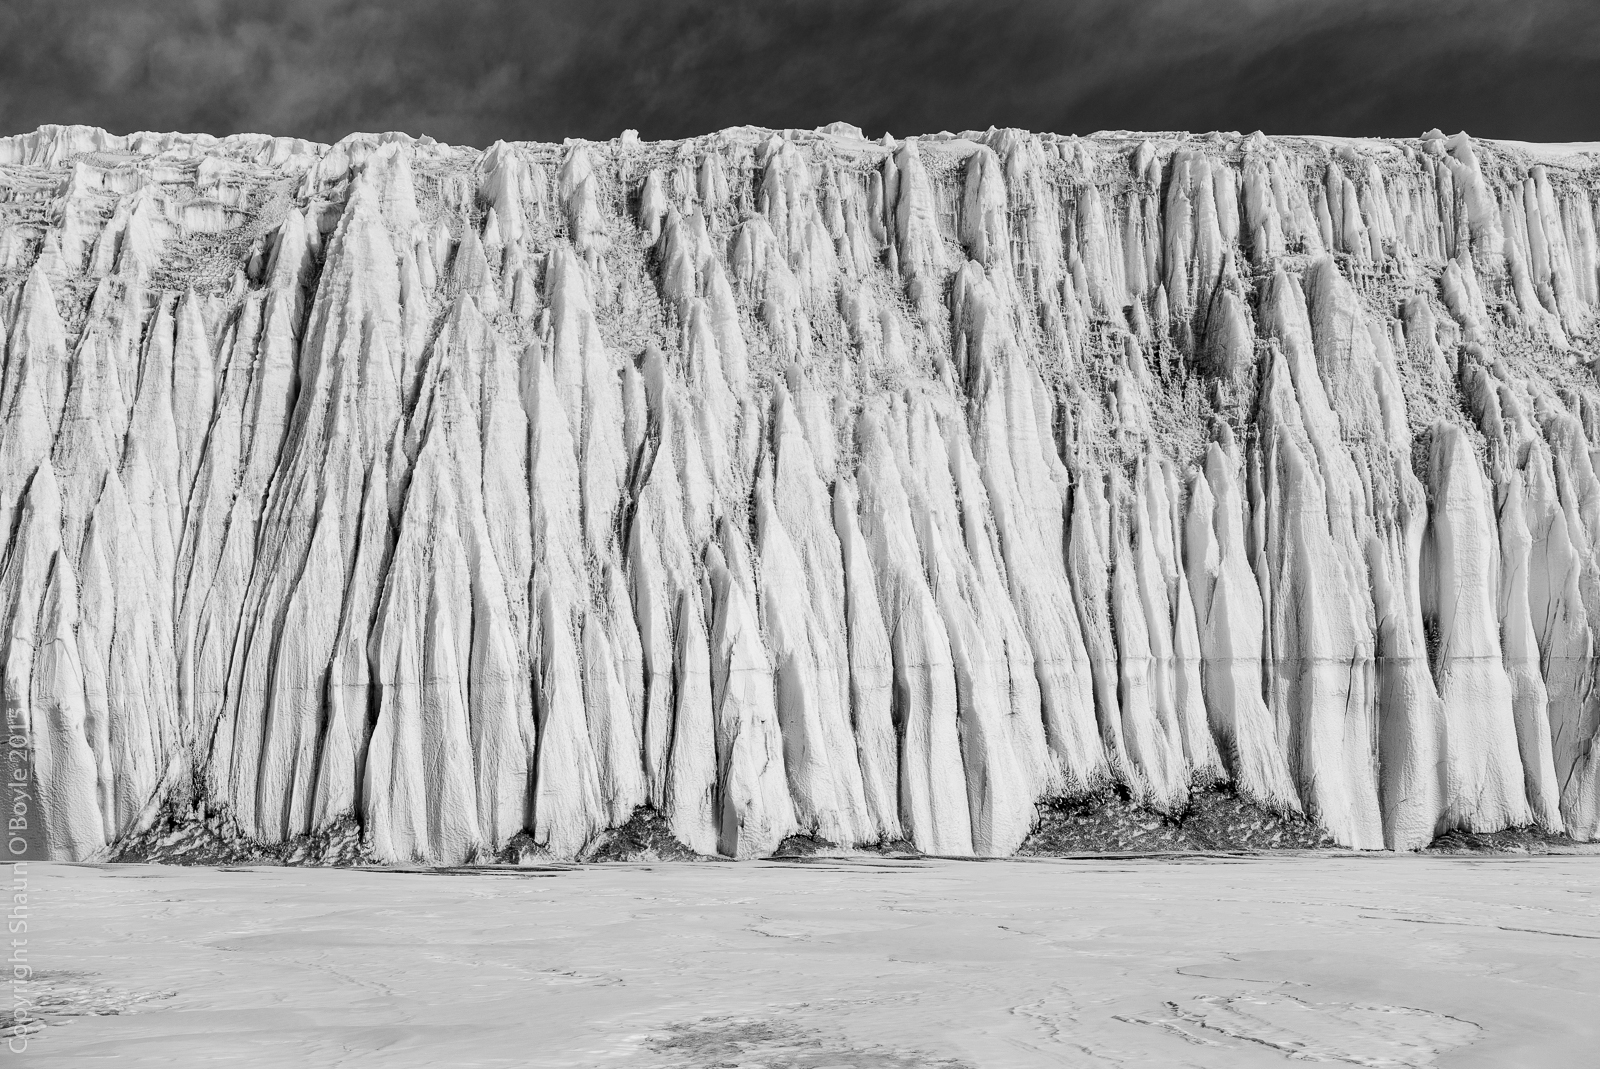 Canada Glacier at Lake Fryxell